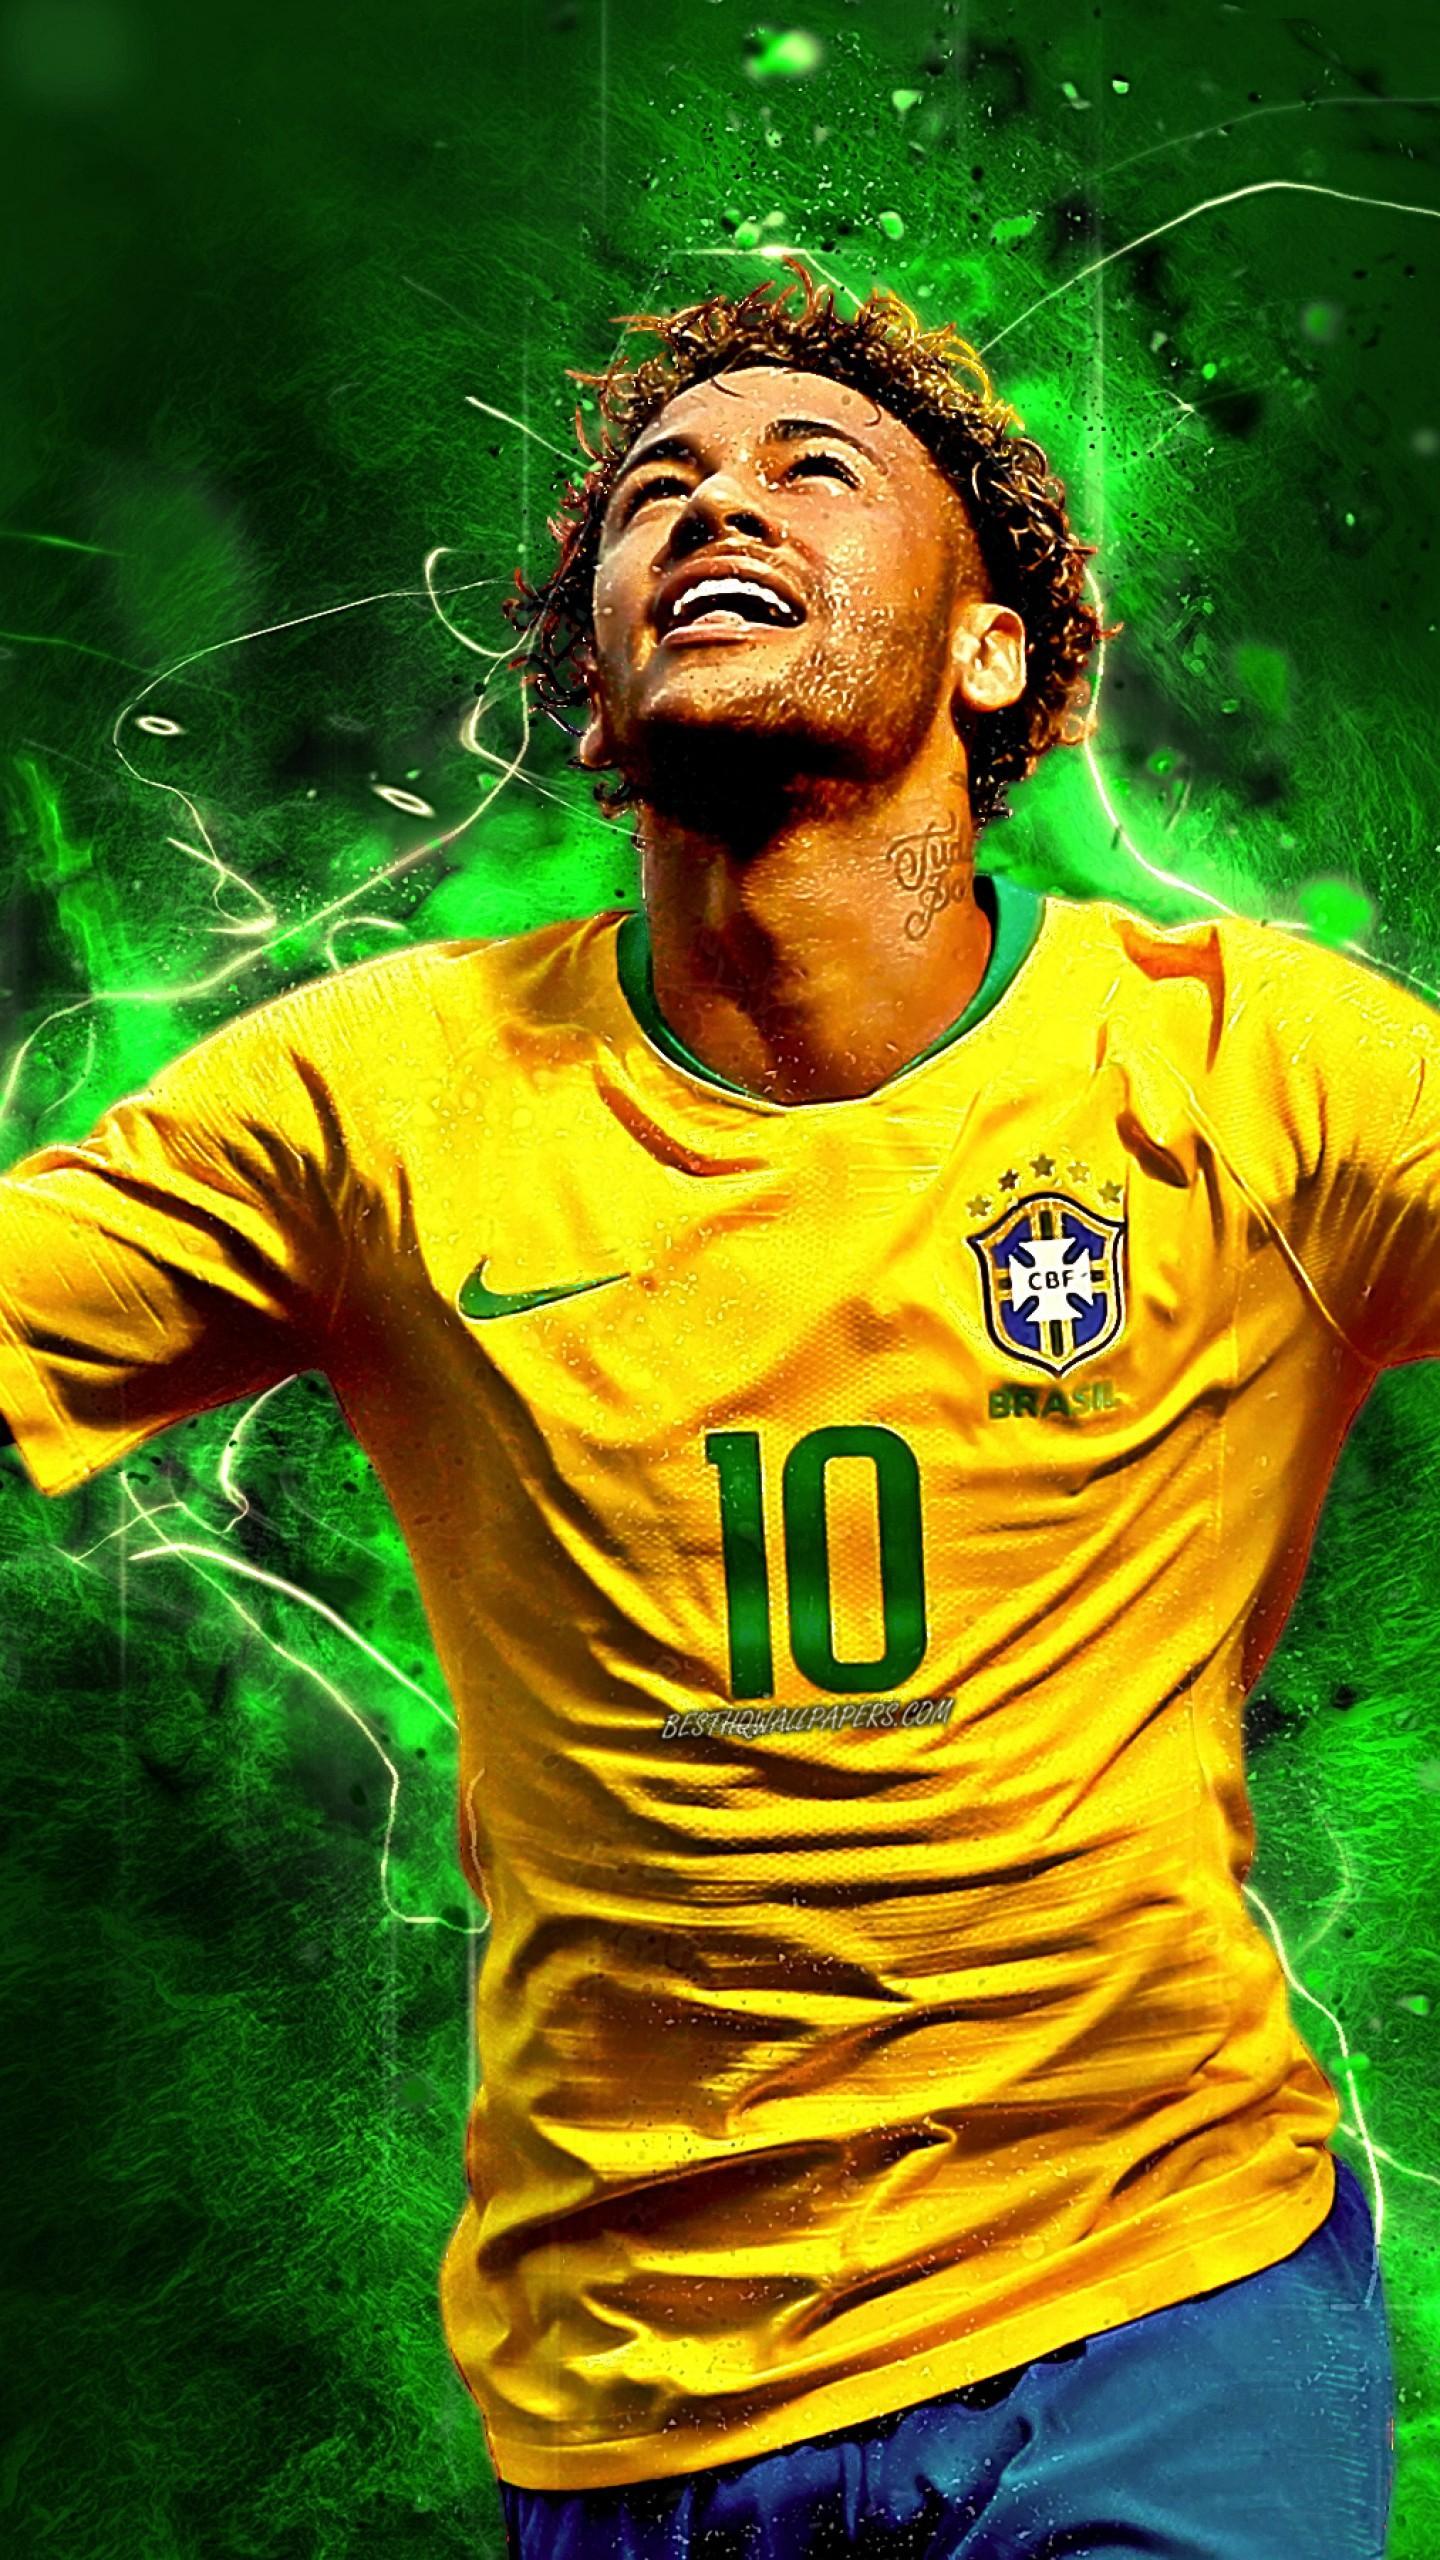 عکس زمینه نیمار با لباس طلایی تیم فوتبال برزیل پس زمینه